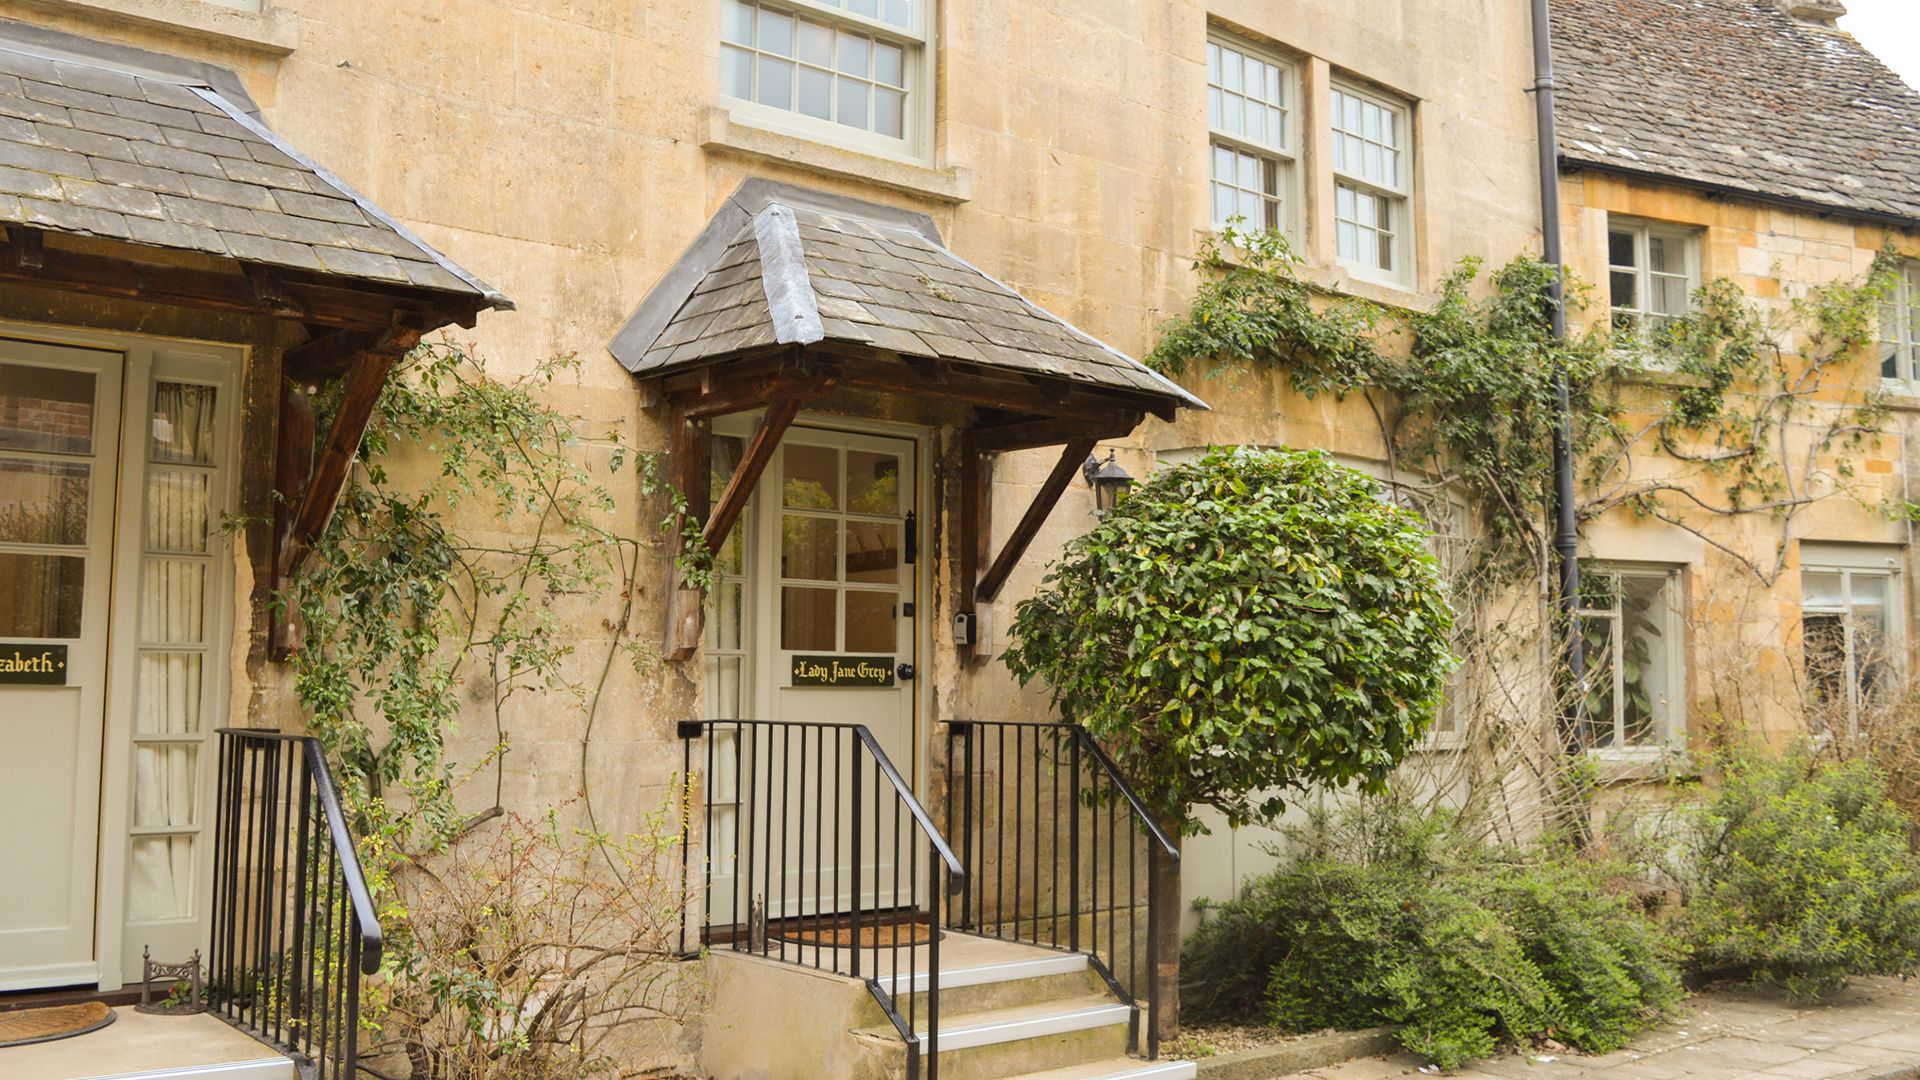 Lady Jane Grey Cottage at Sudeley Castle, Bolthole Retreats